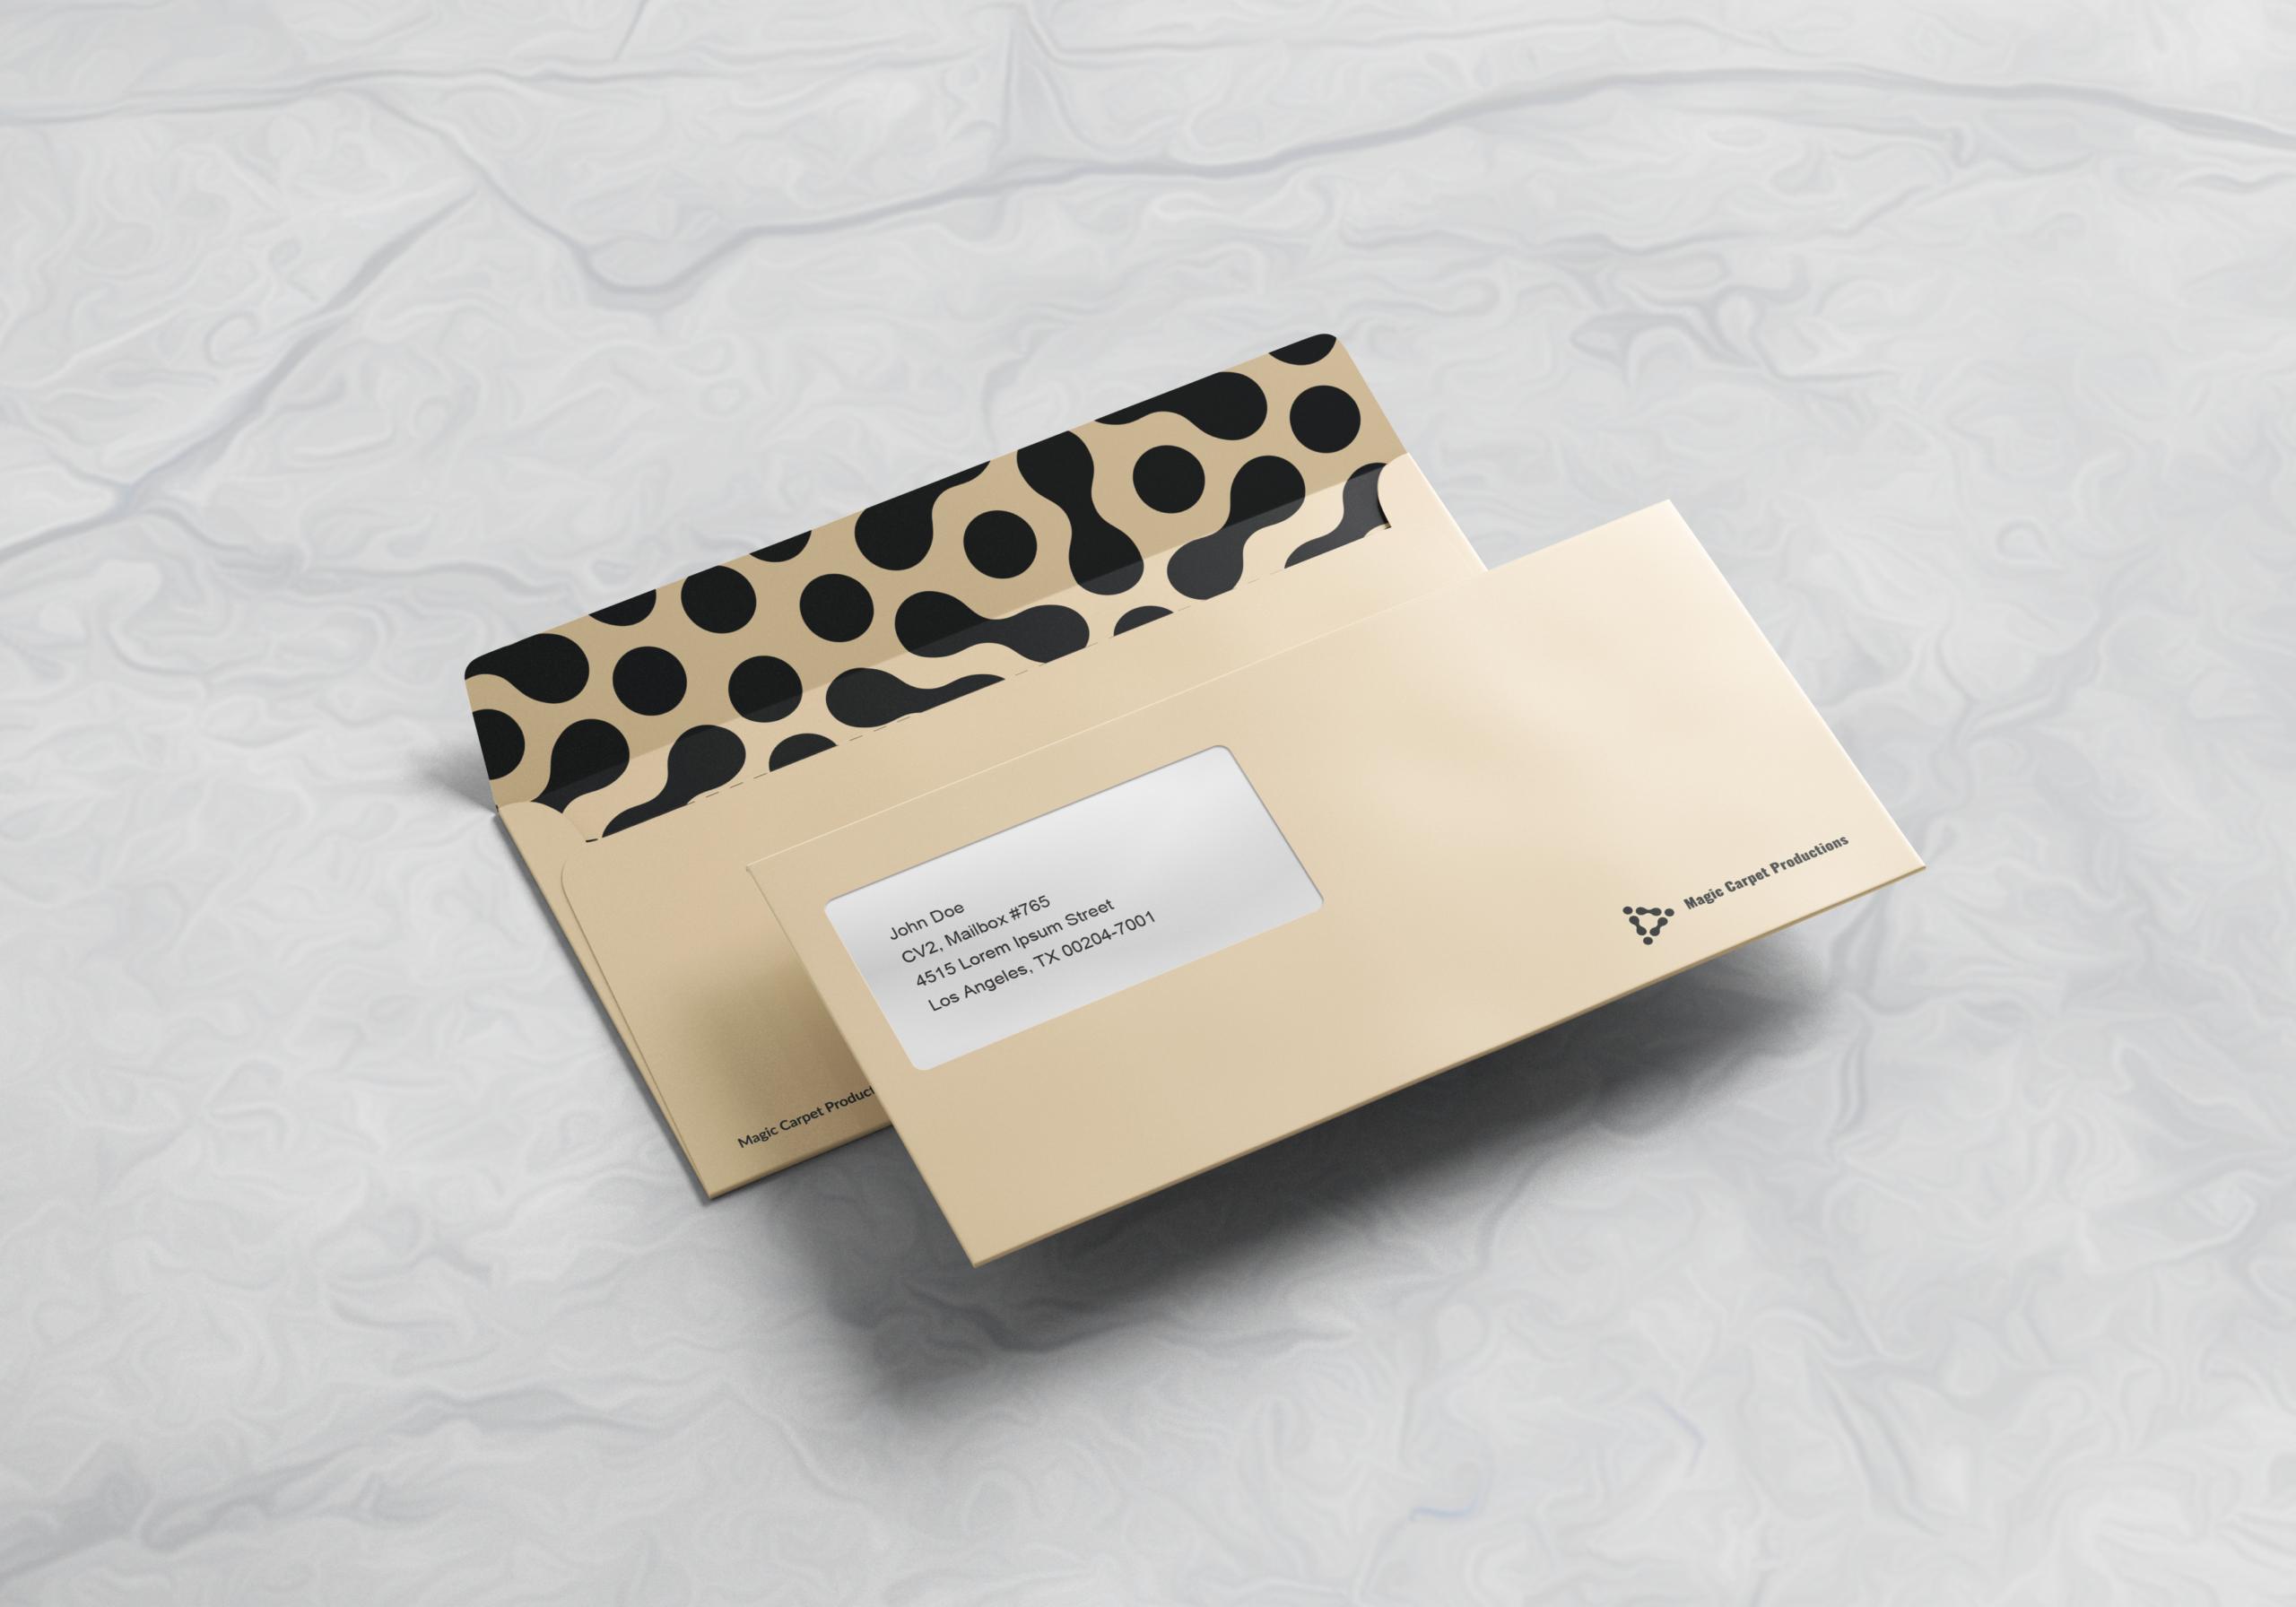 Ace Digital created envelope design for Magic Carpet Productions